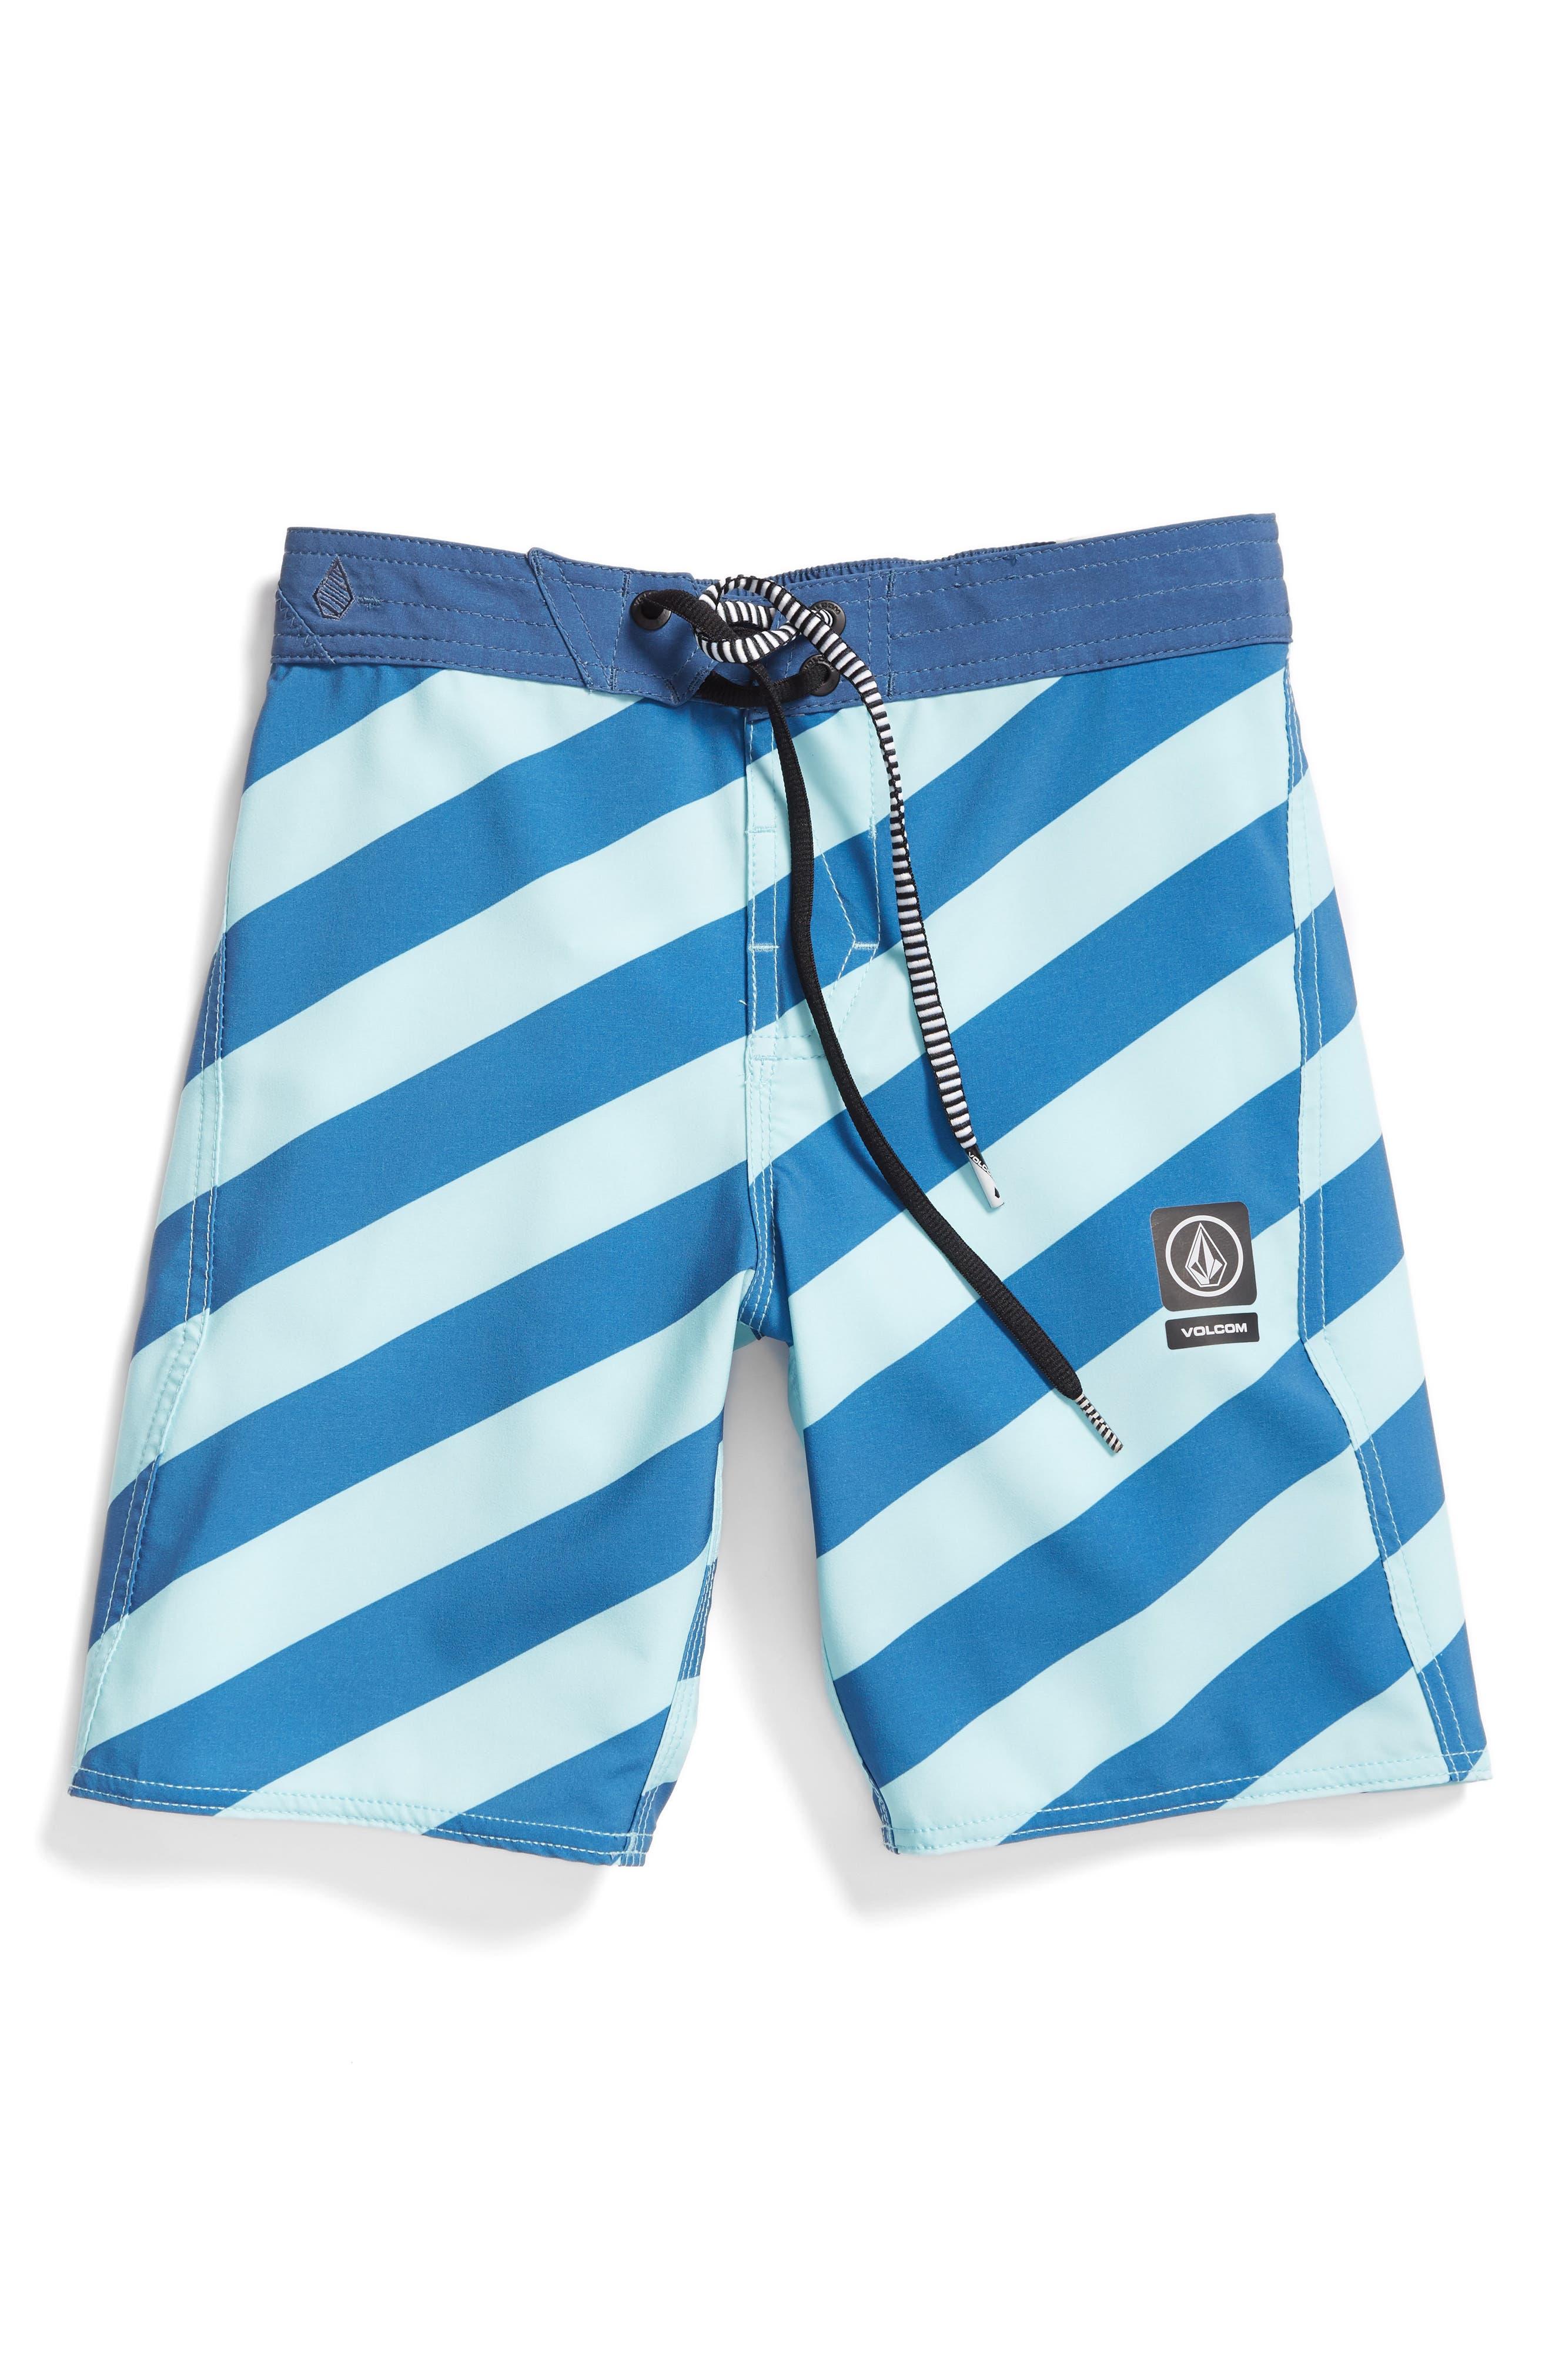 Stripey Jammer Board Shorts,                             Main thumbnail 1, color,                             Deep Water